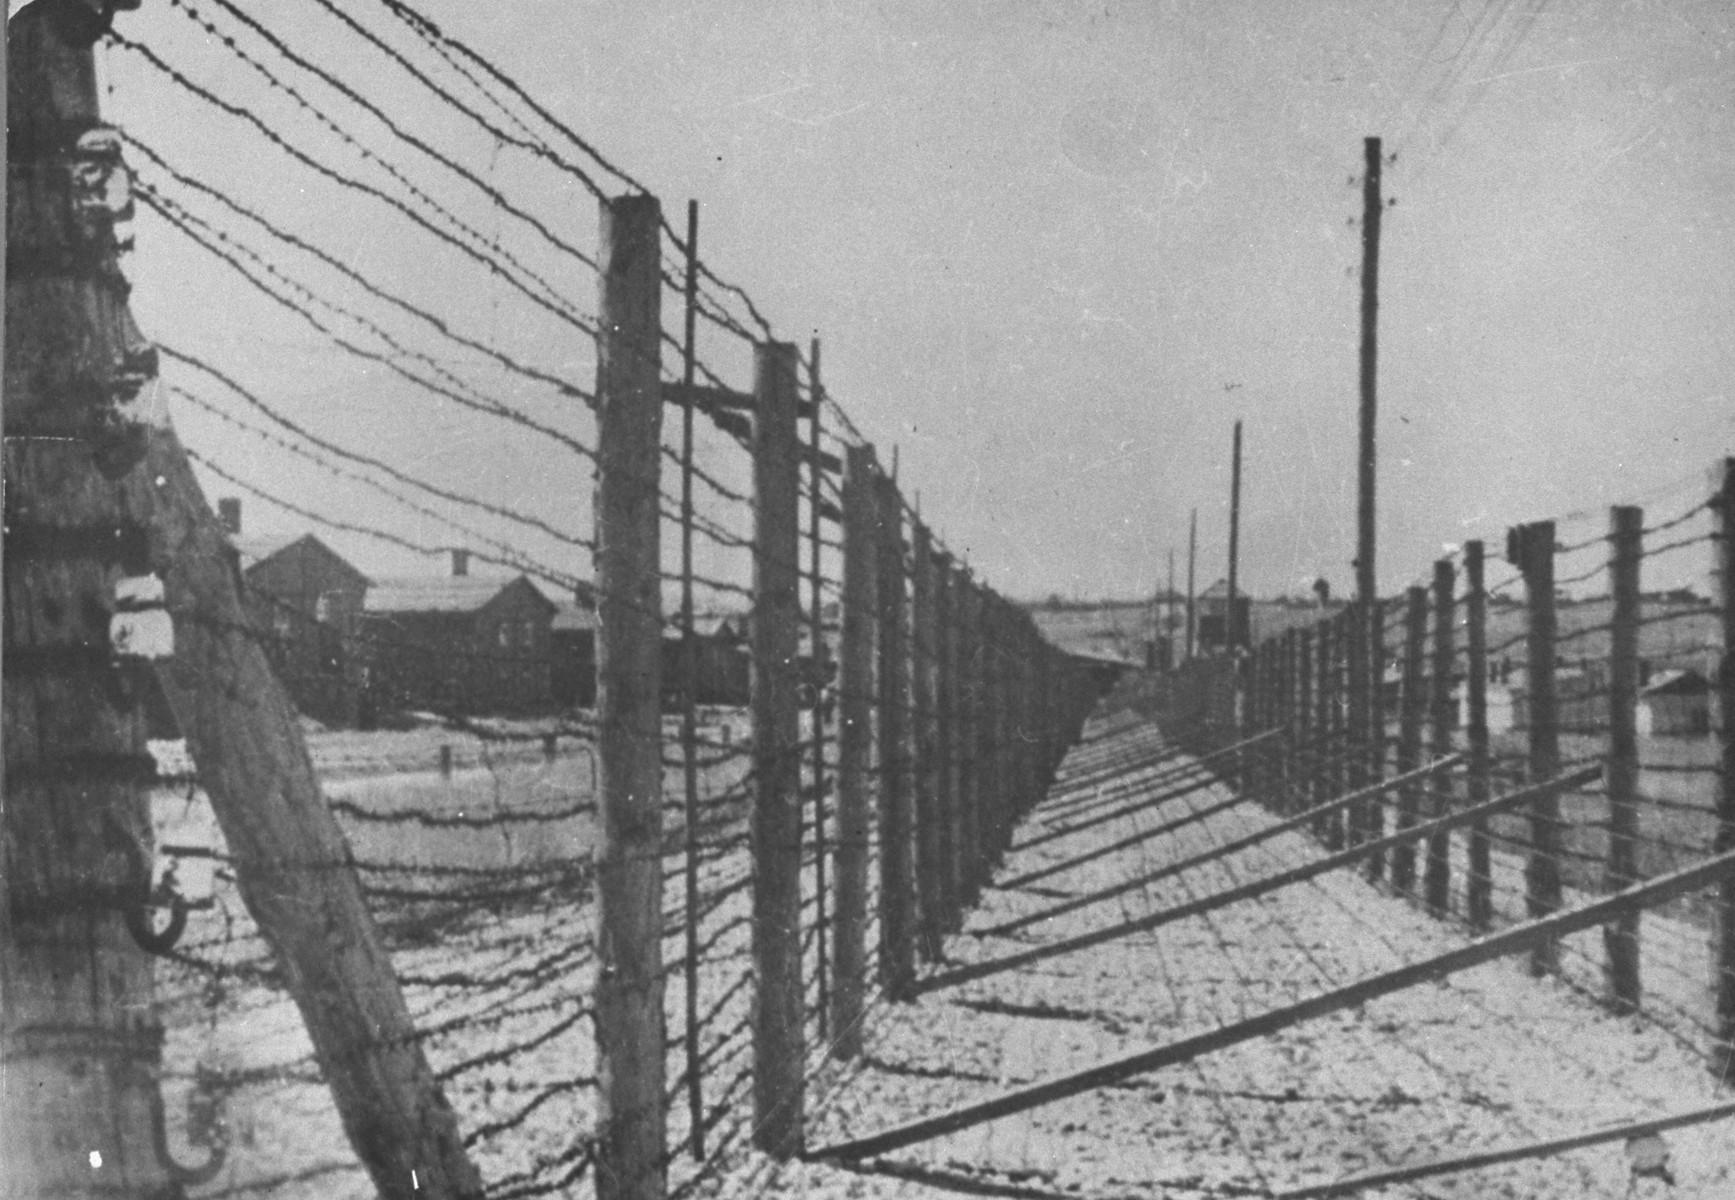 A view of the fences that enclosed Majdanek.